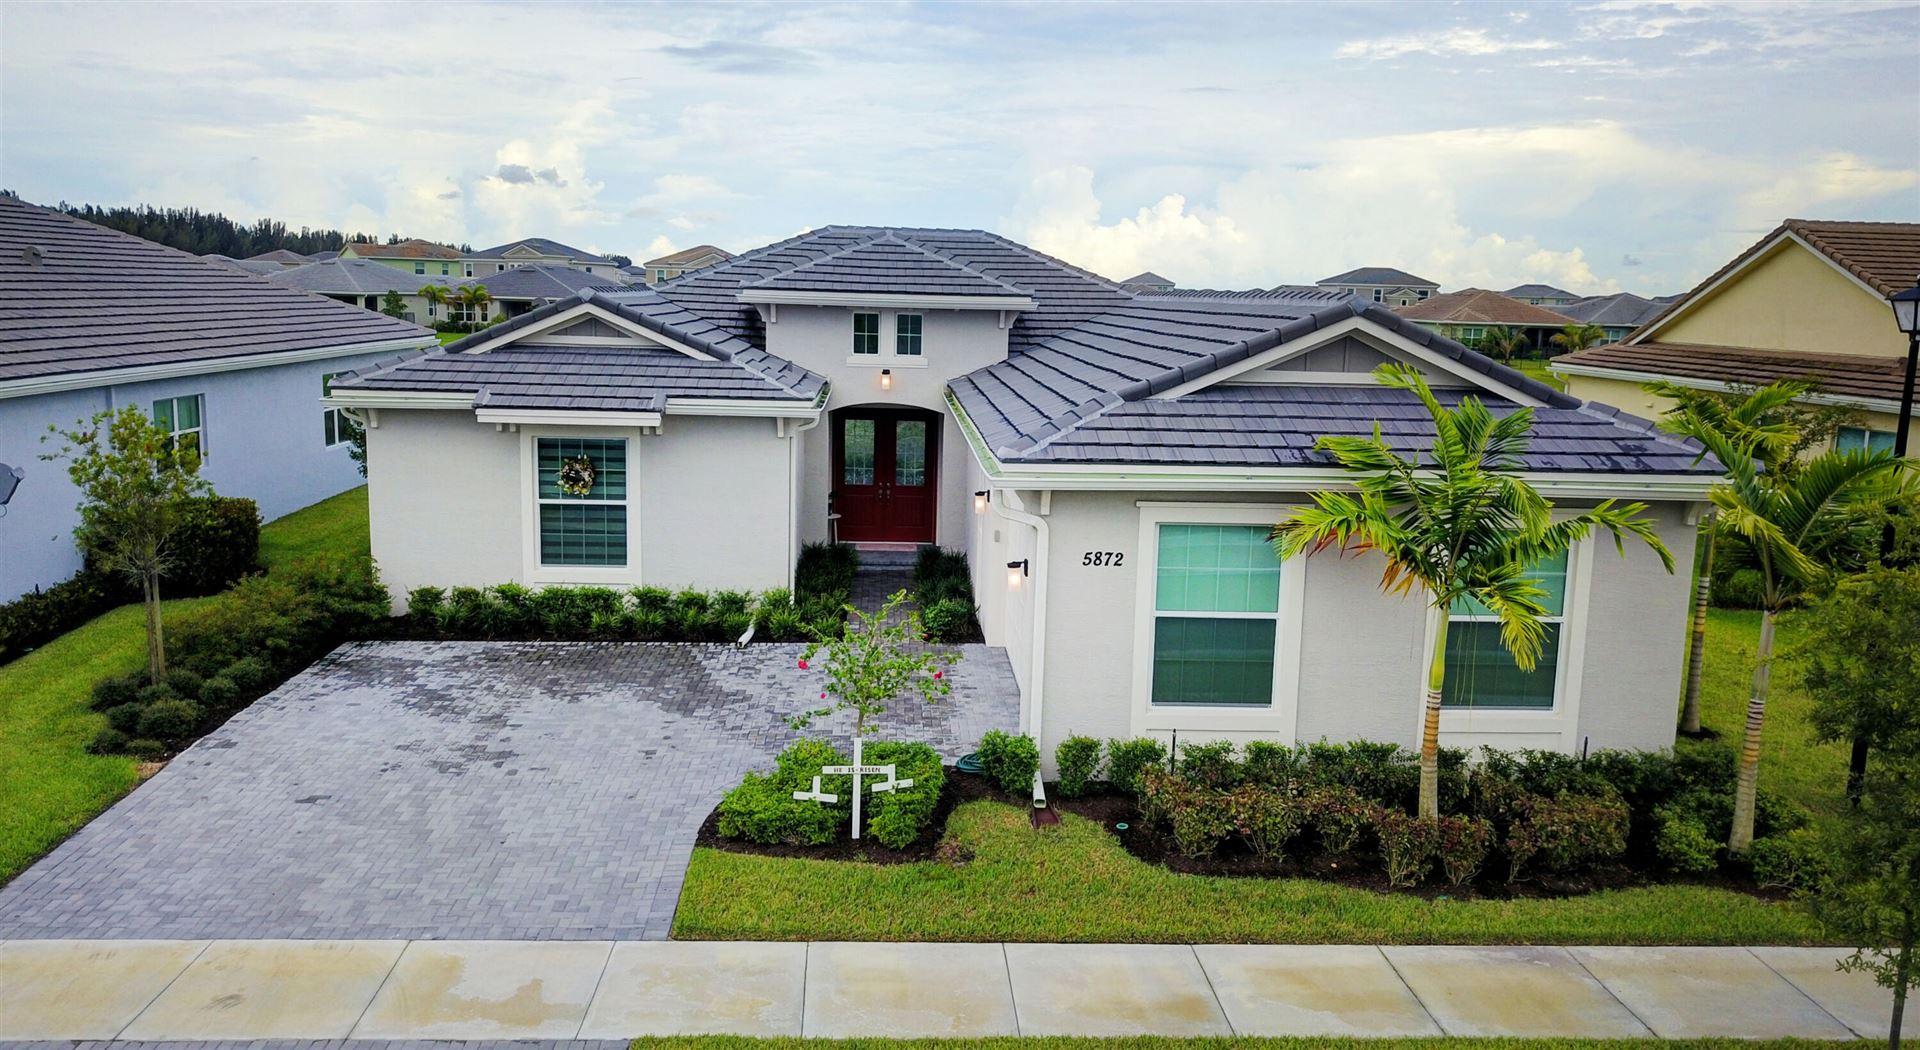 5872 Whippoorwill Circle, Loxahatchee Groves, FL 33470 - MLS#: RX-10746934